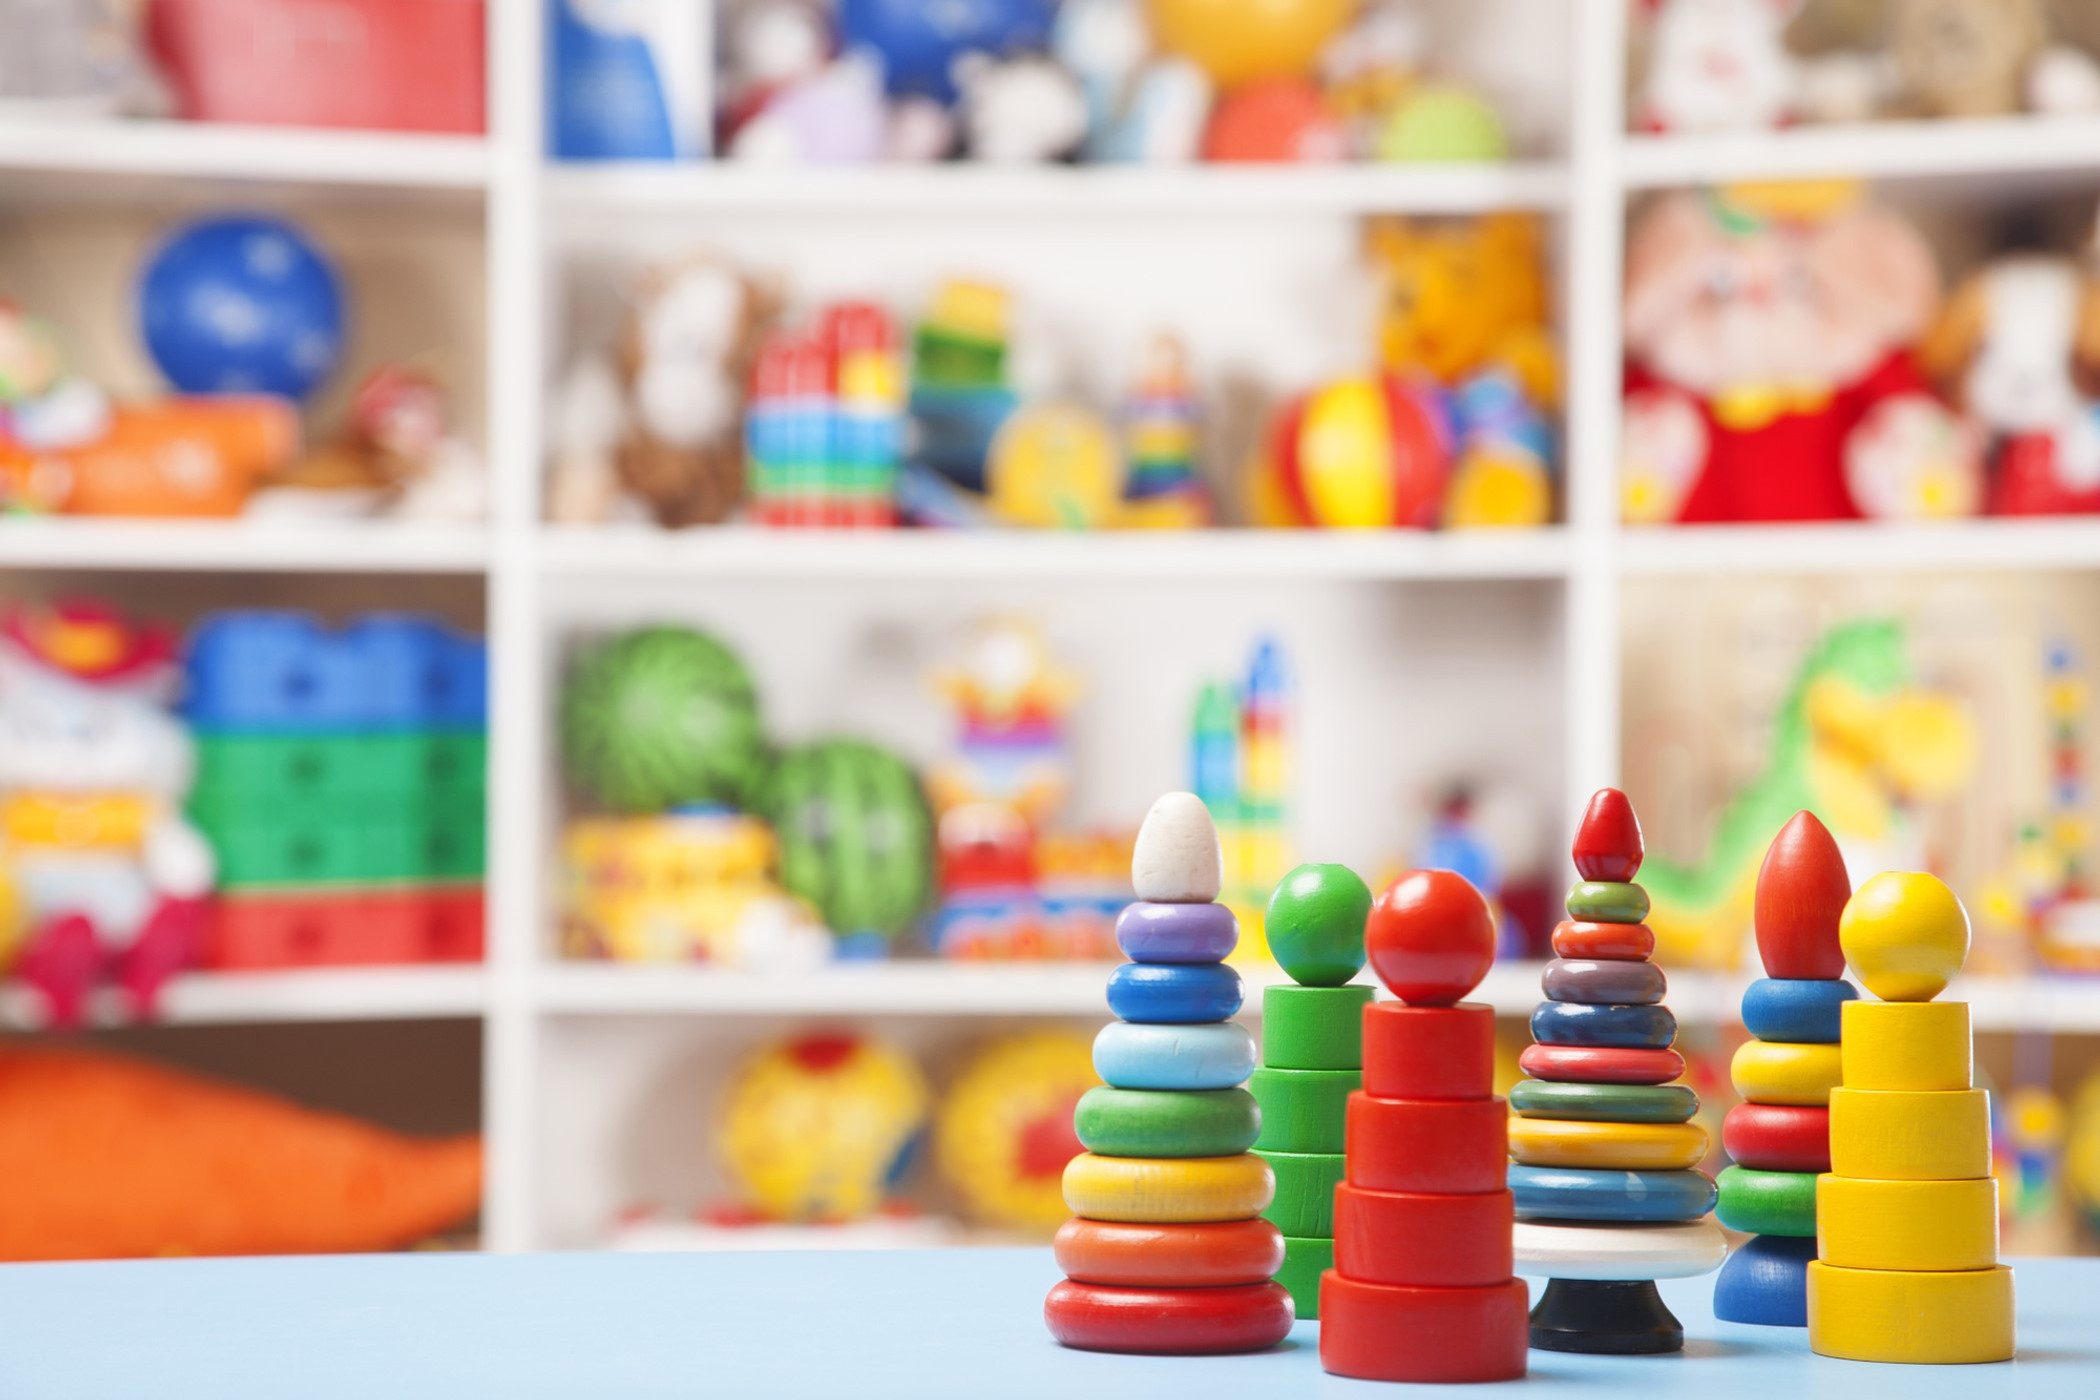 Organize Child's Playroom